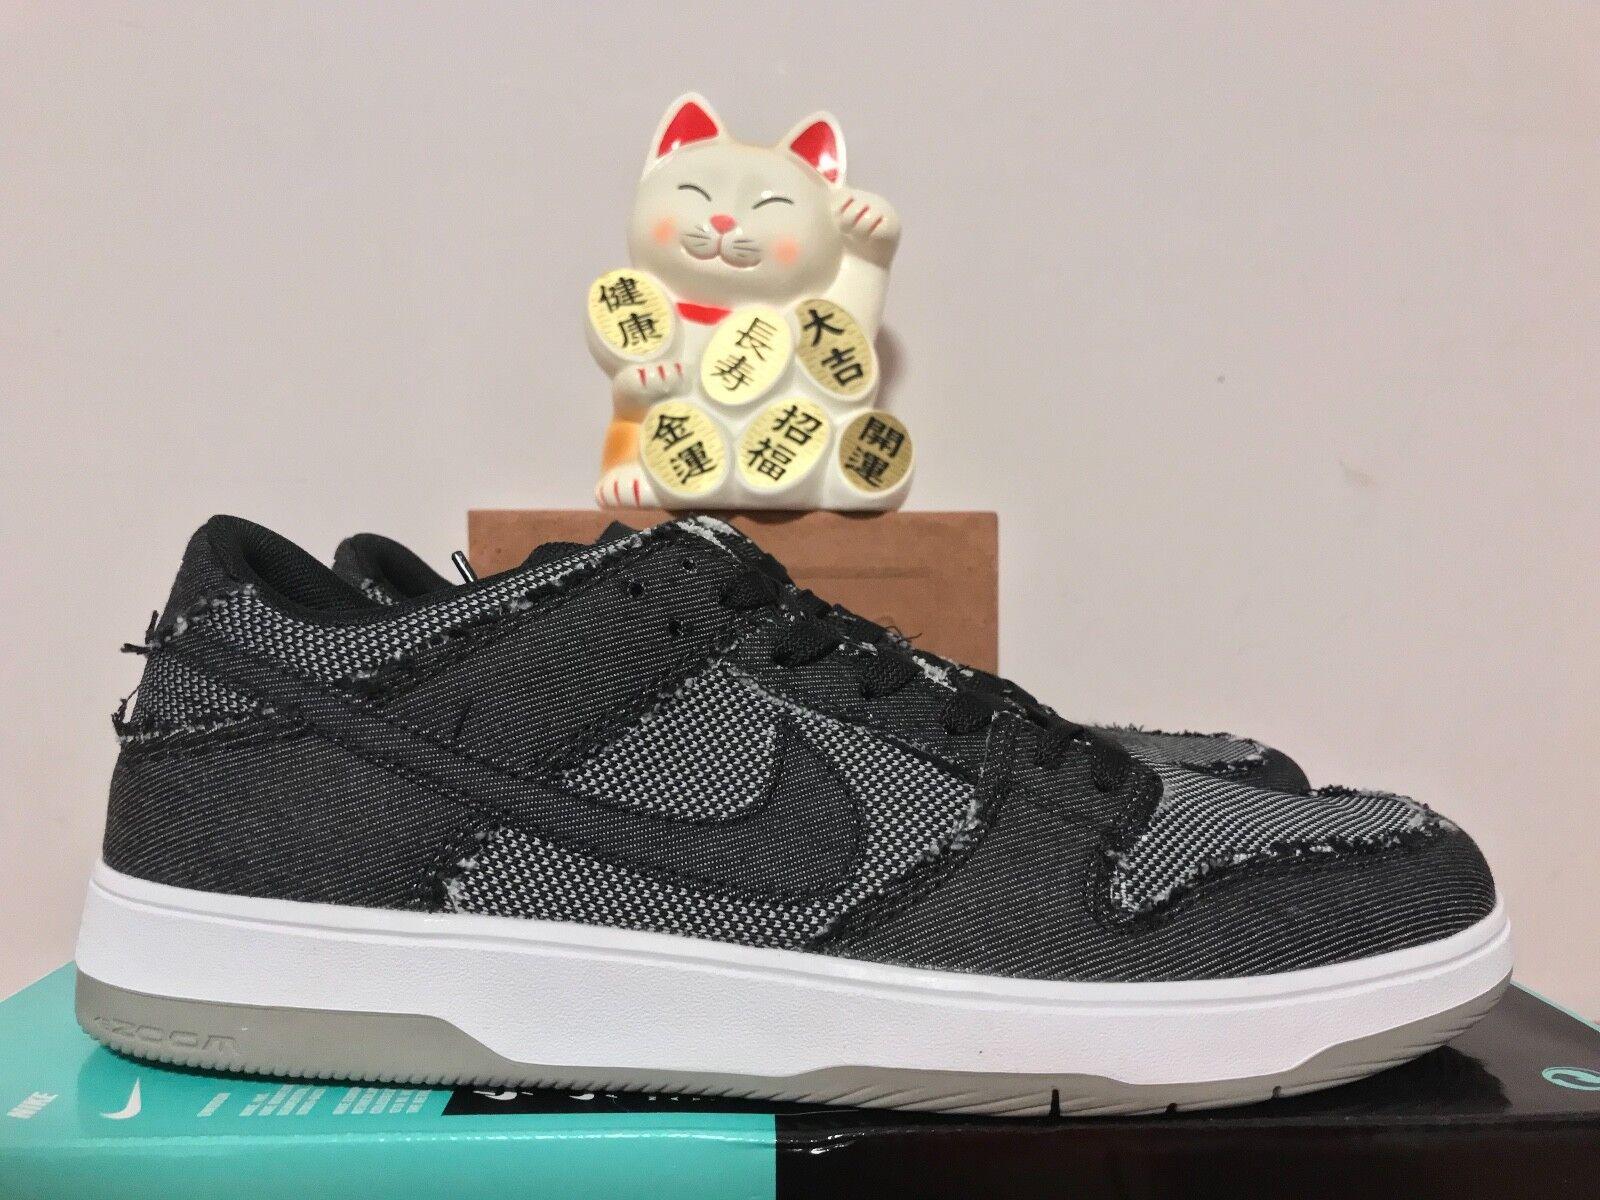 Nike Elite SB Zoom Dunk Low Elite Nike QS Medicom BearBrick New Size 8.5 [877063-002] 8499a4